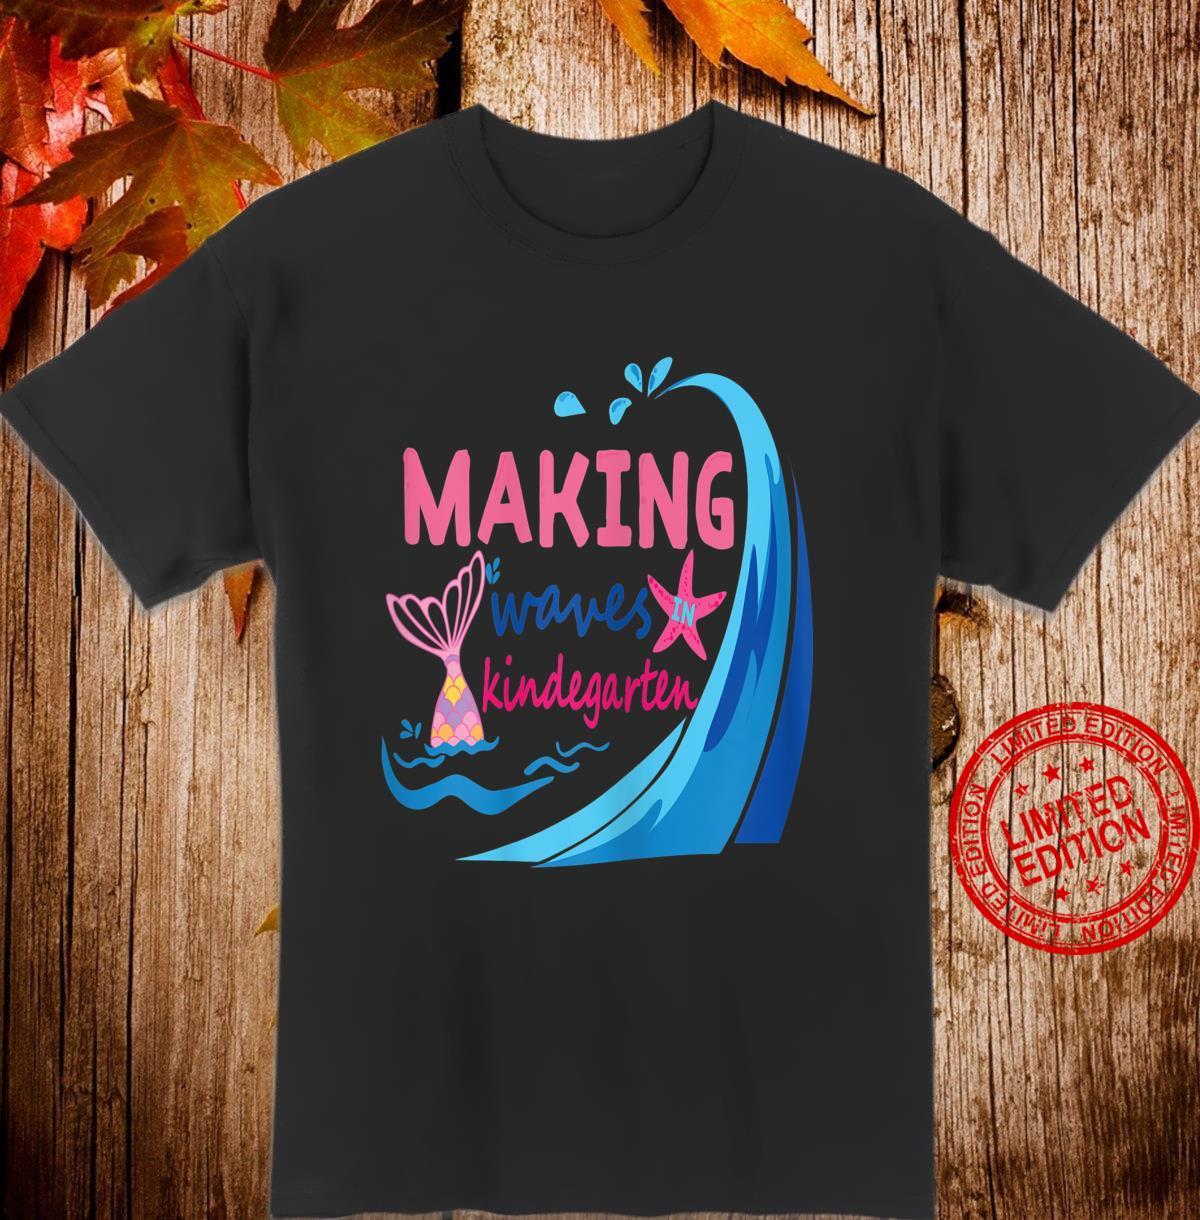 Mermaid Making Waves in Kindergarten Shirt,Back to School Shirt